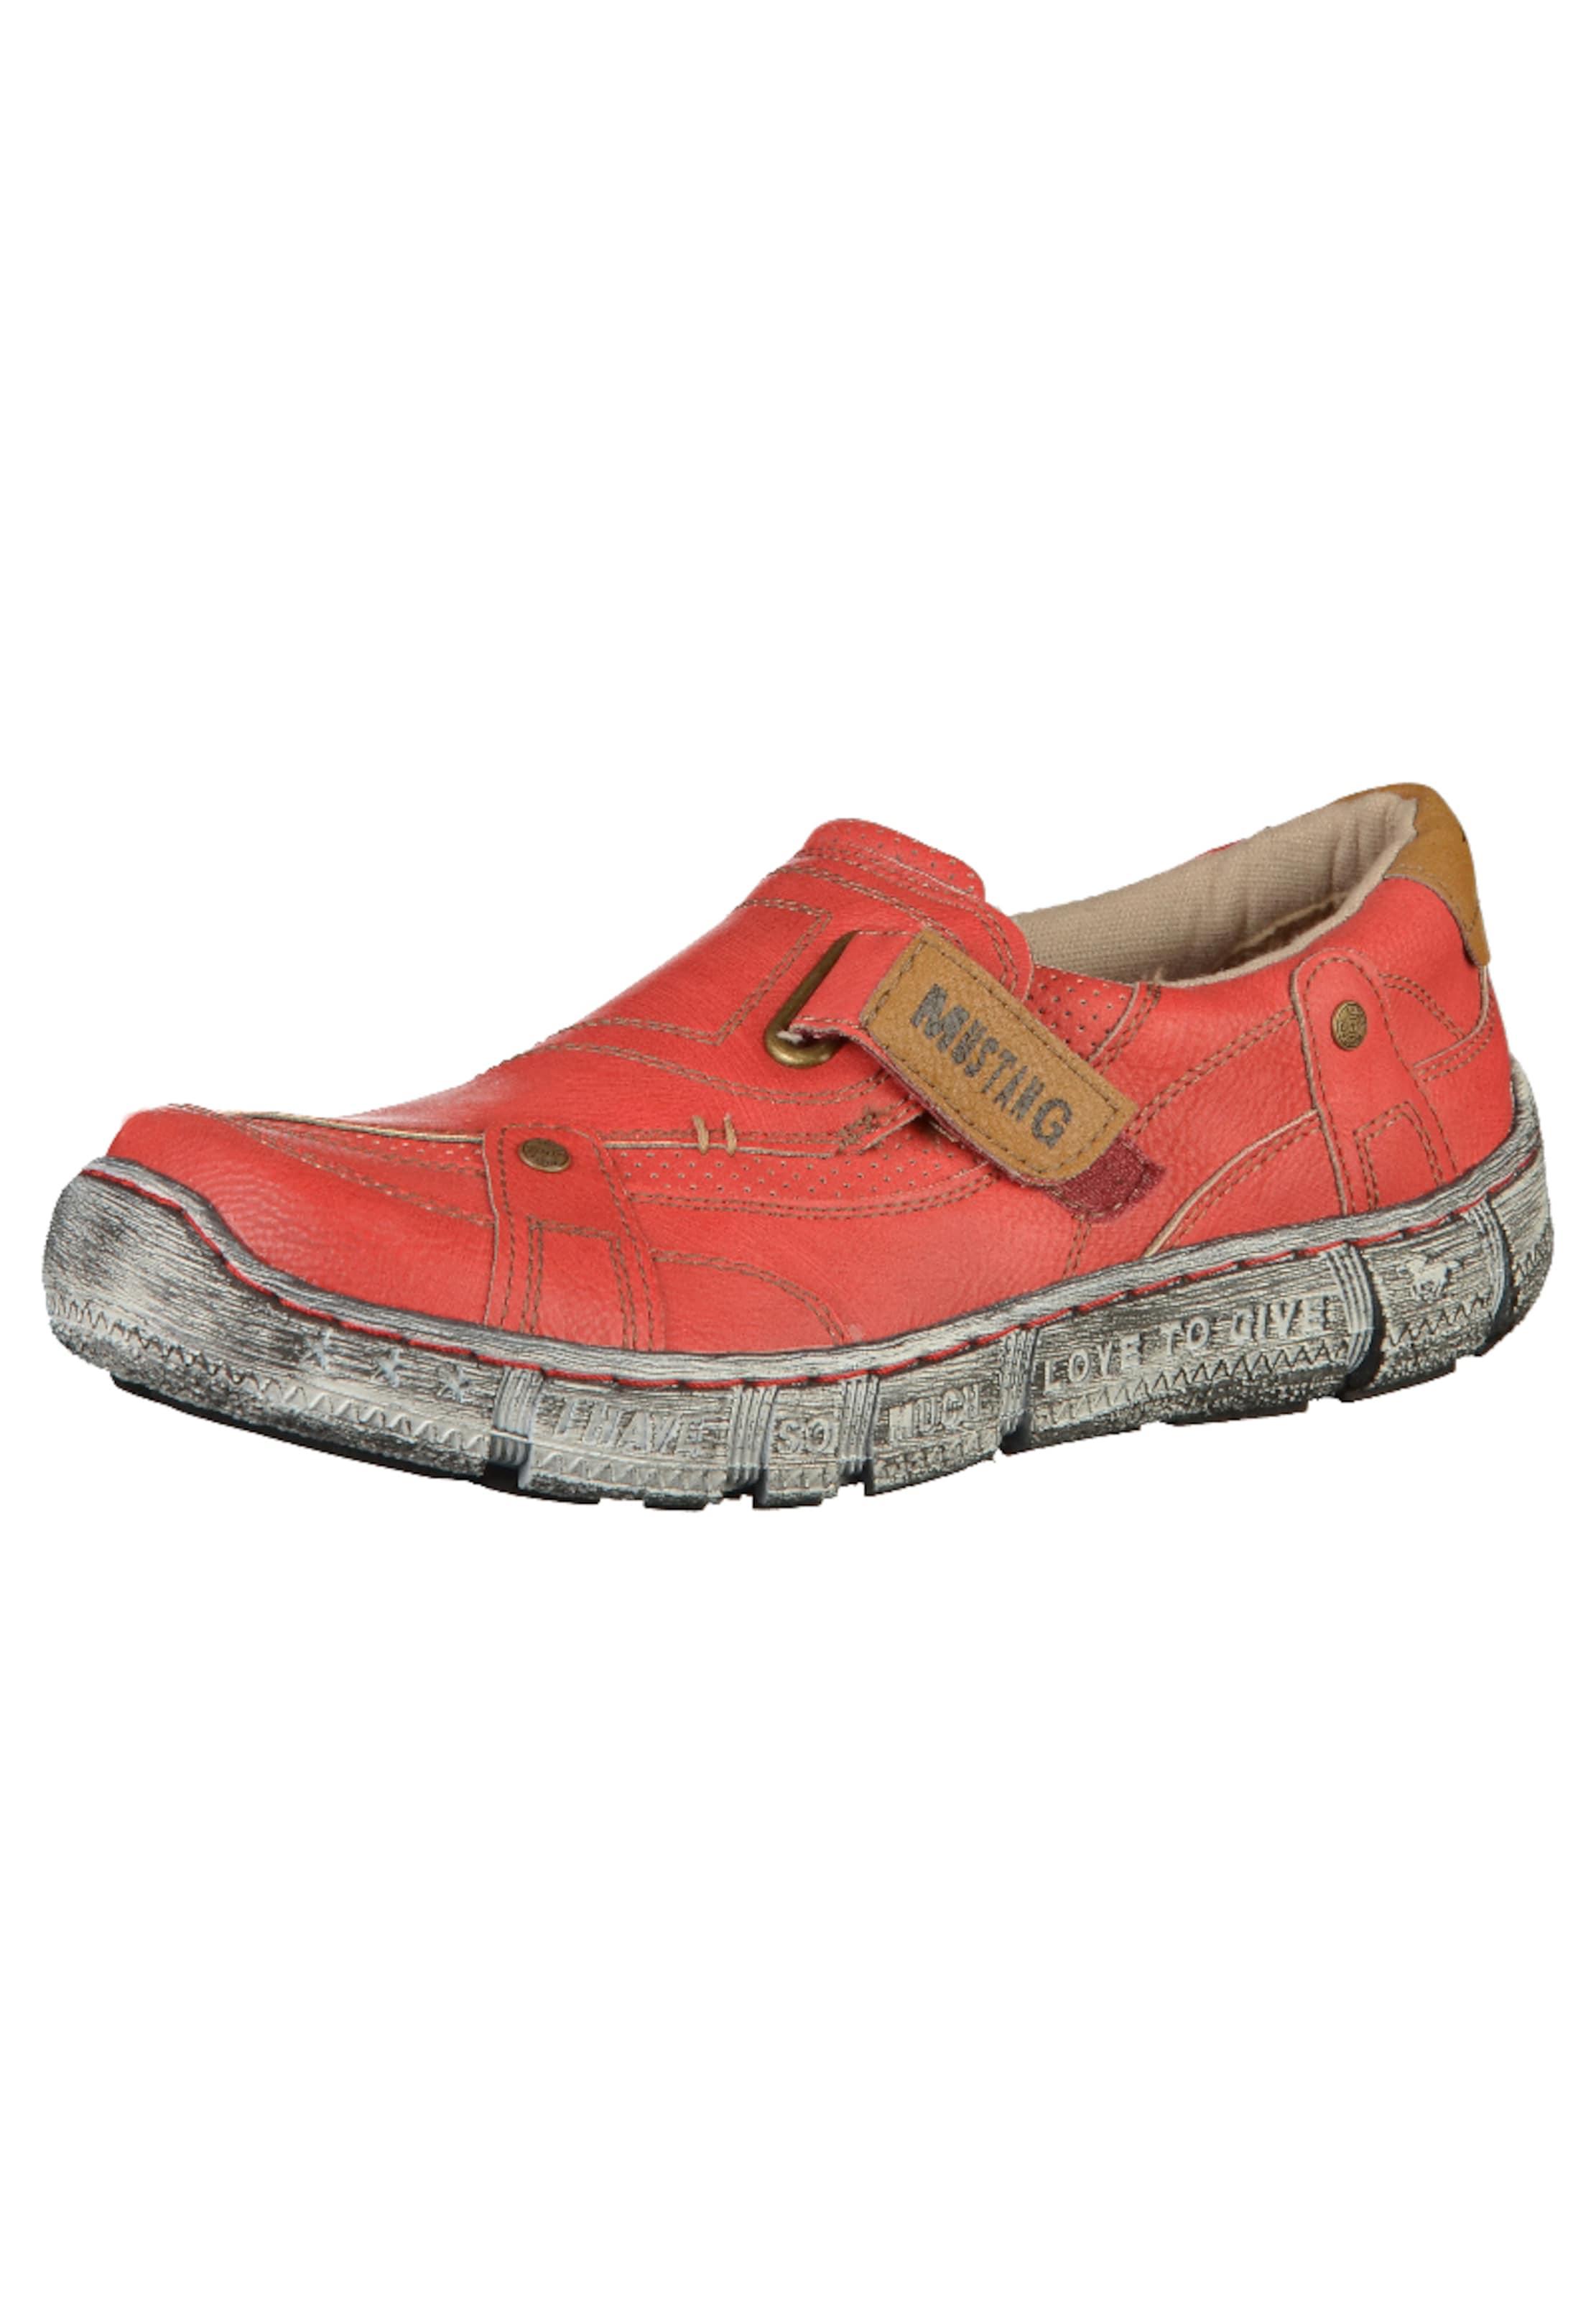 MUSTANG Halbschuhe Günstige und langlebige Schuhe